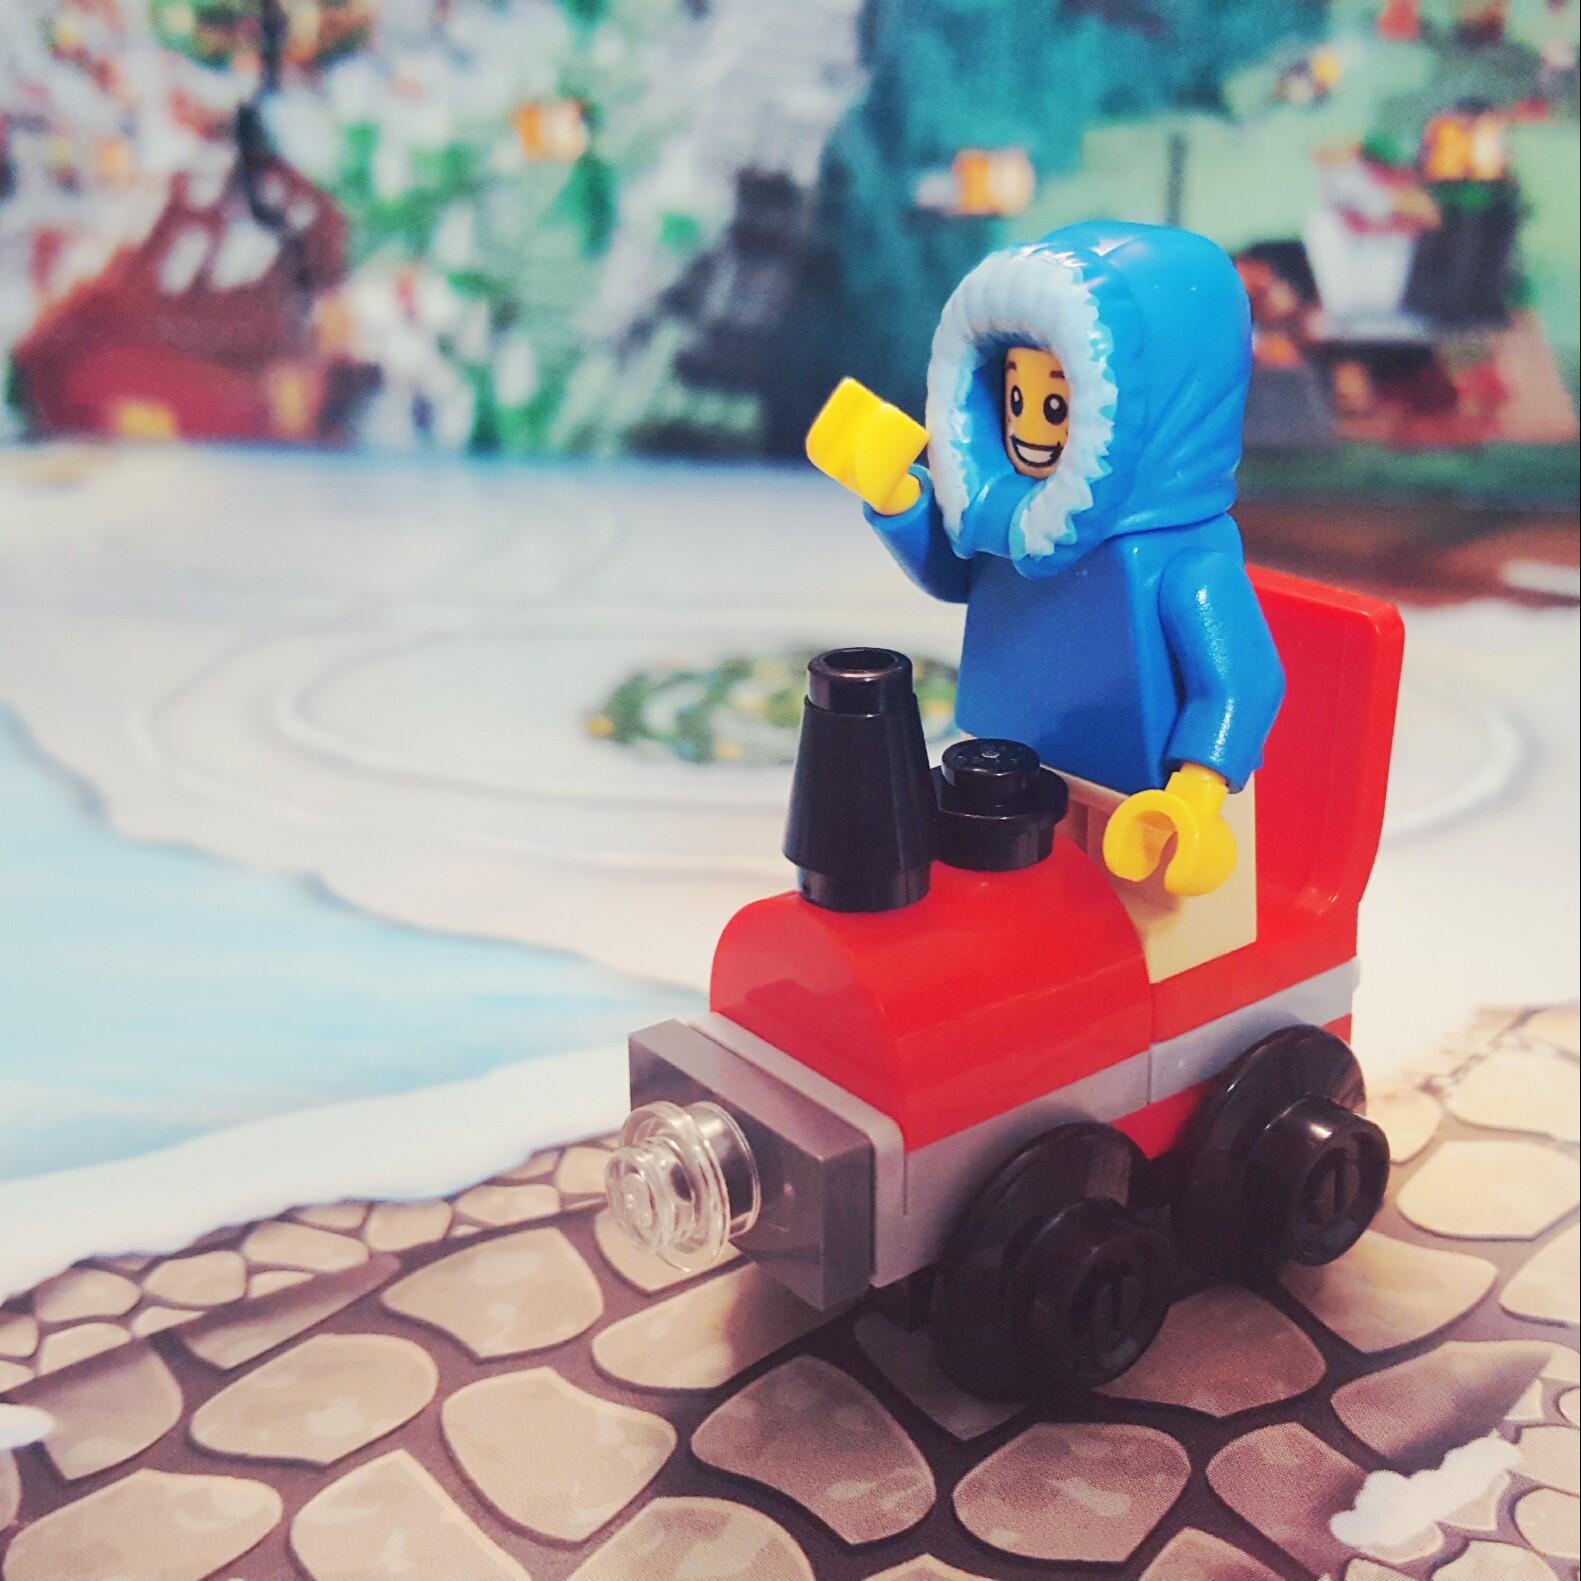 """Choo! Choo!"" - Day 14 Train Locomotive from LEGO City Advent Calendar"